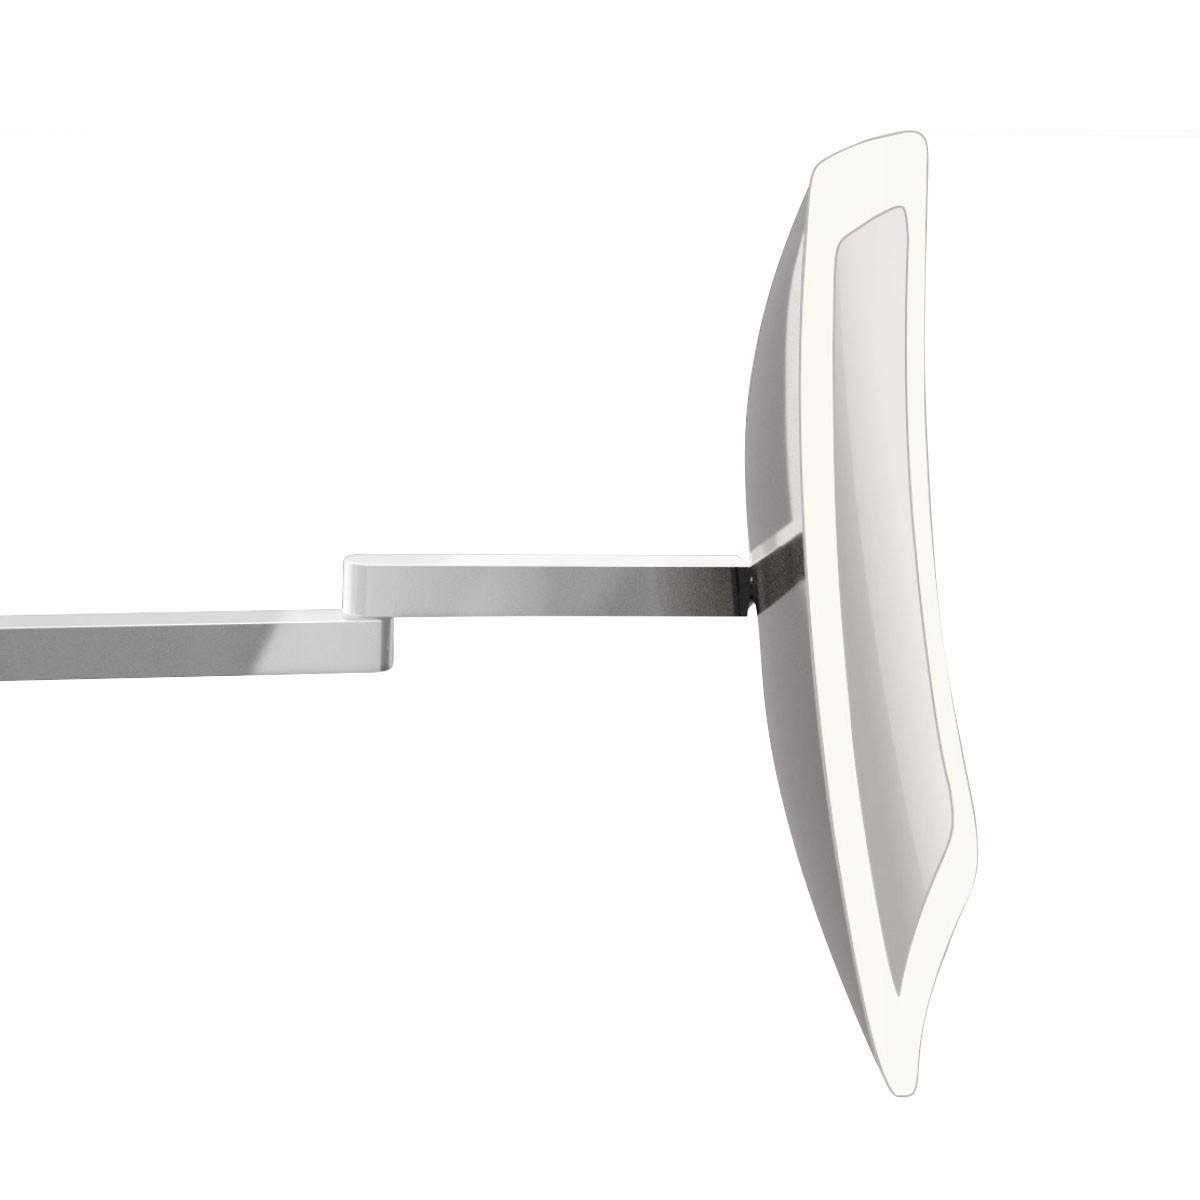 » WANDKOSMETIKSPIEGEL » beleuchtet » ALISEO 020767  Design Wand